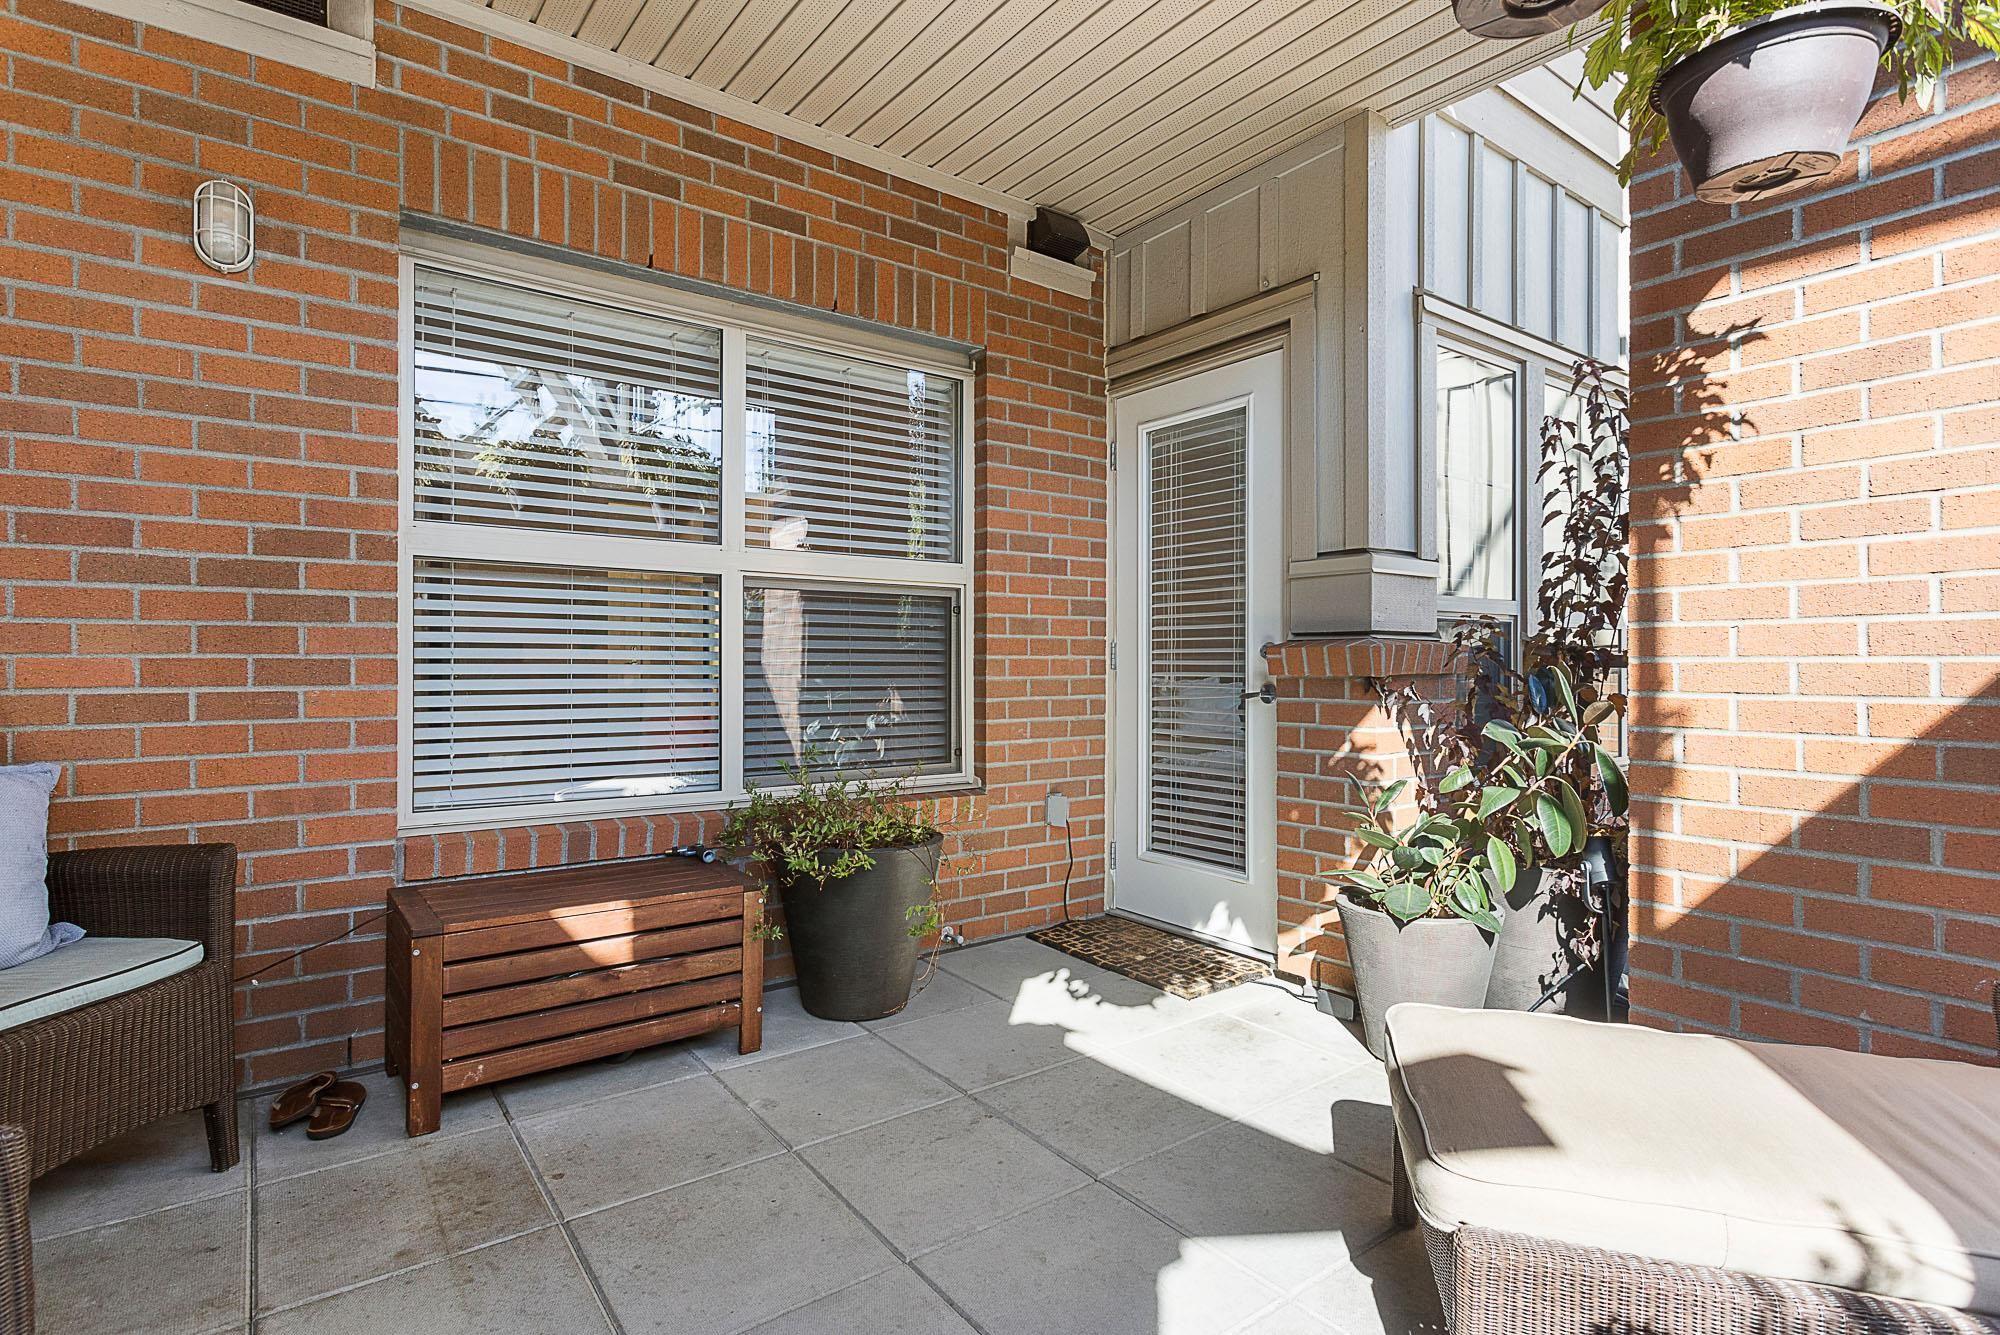 114 20219 54A AVENUE - Langley City Apartment/Condo for sale, 1 Bedroom (R2616172) - #21